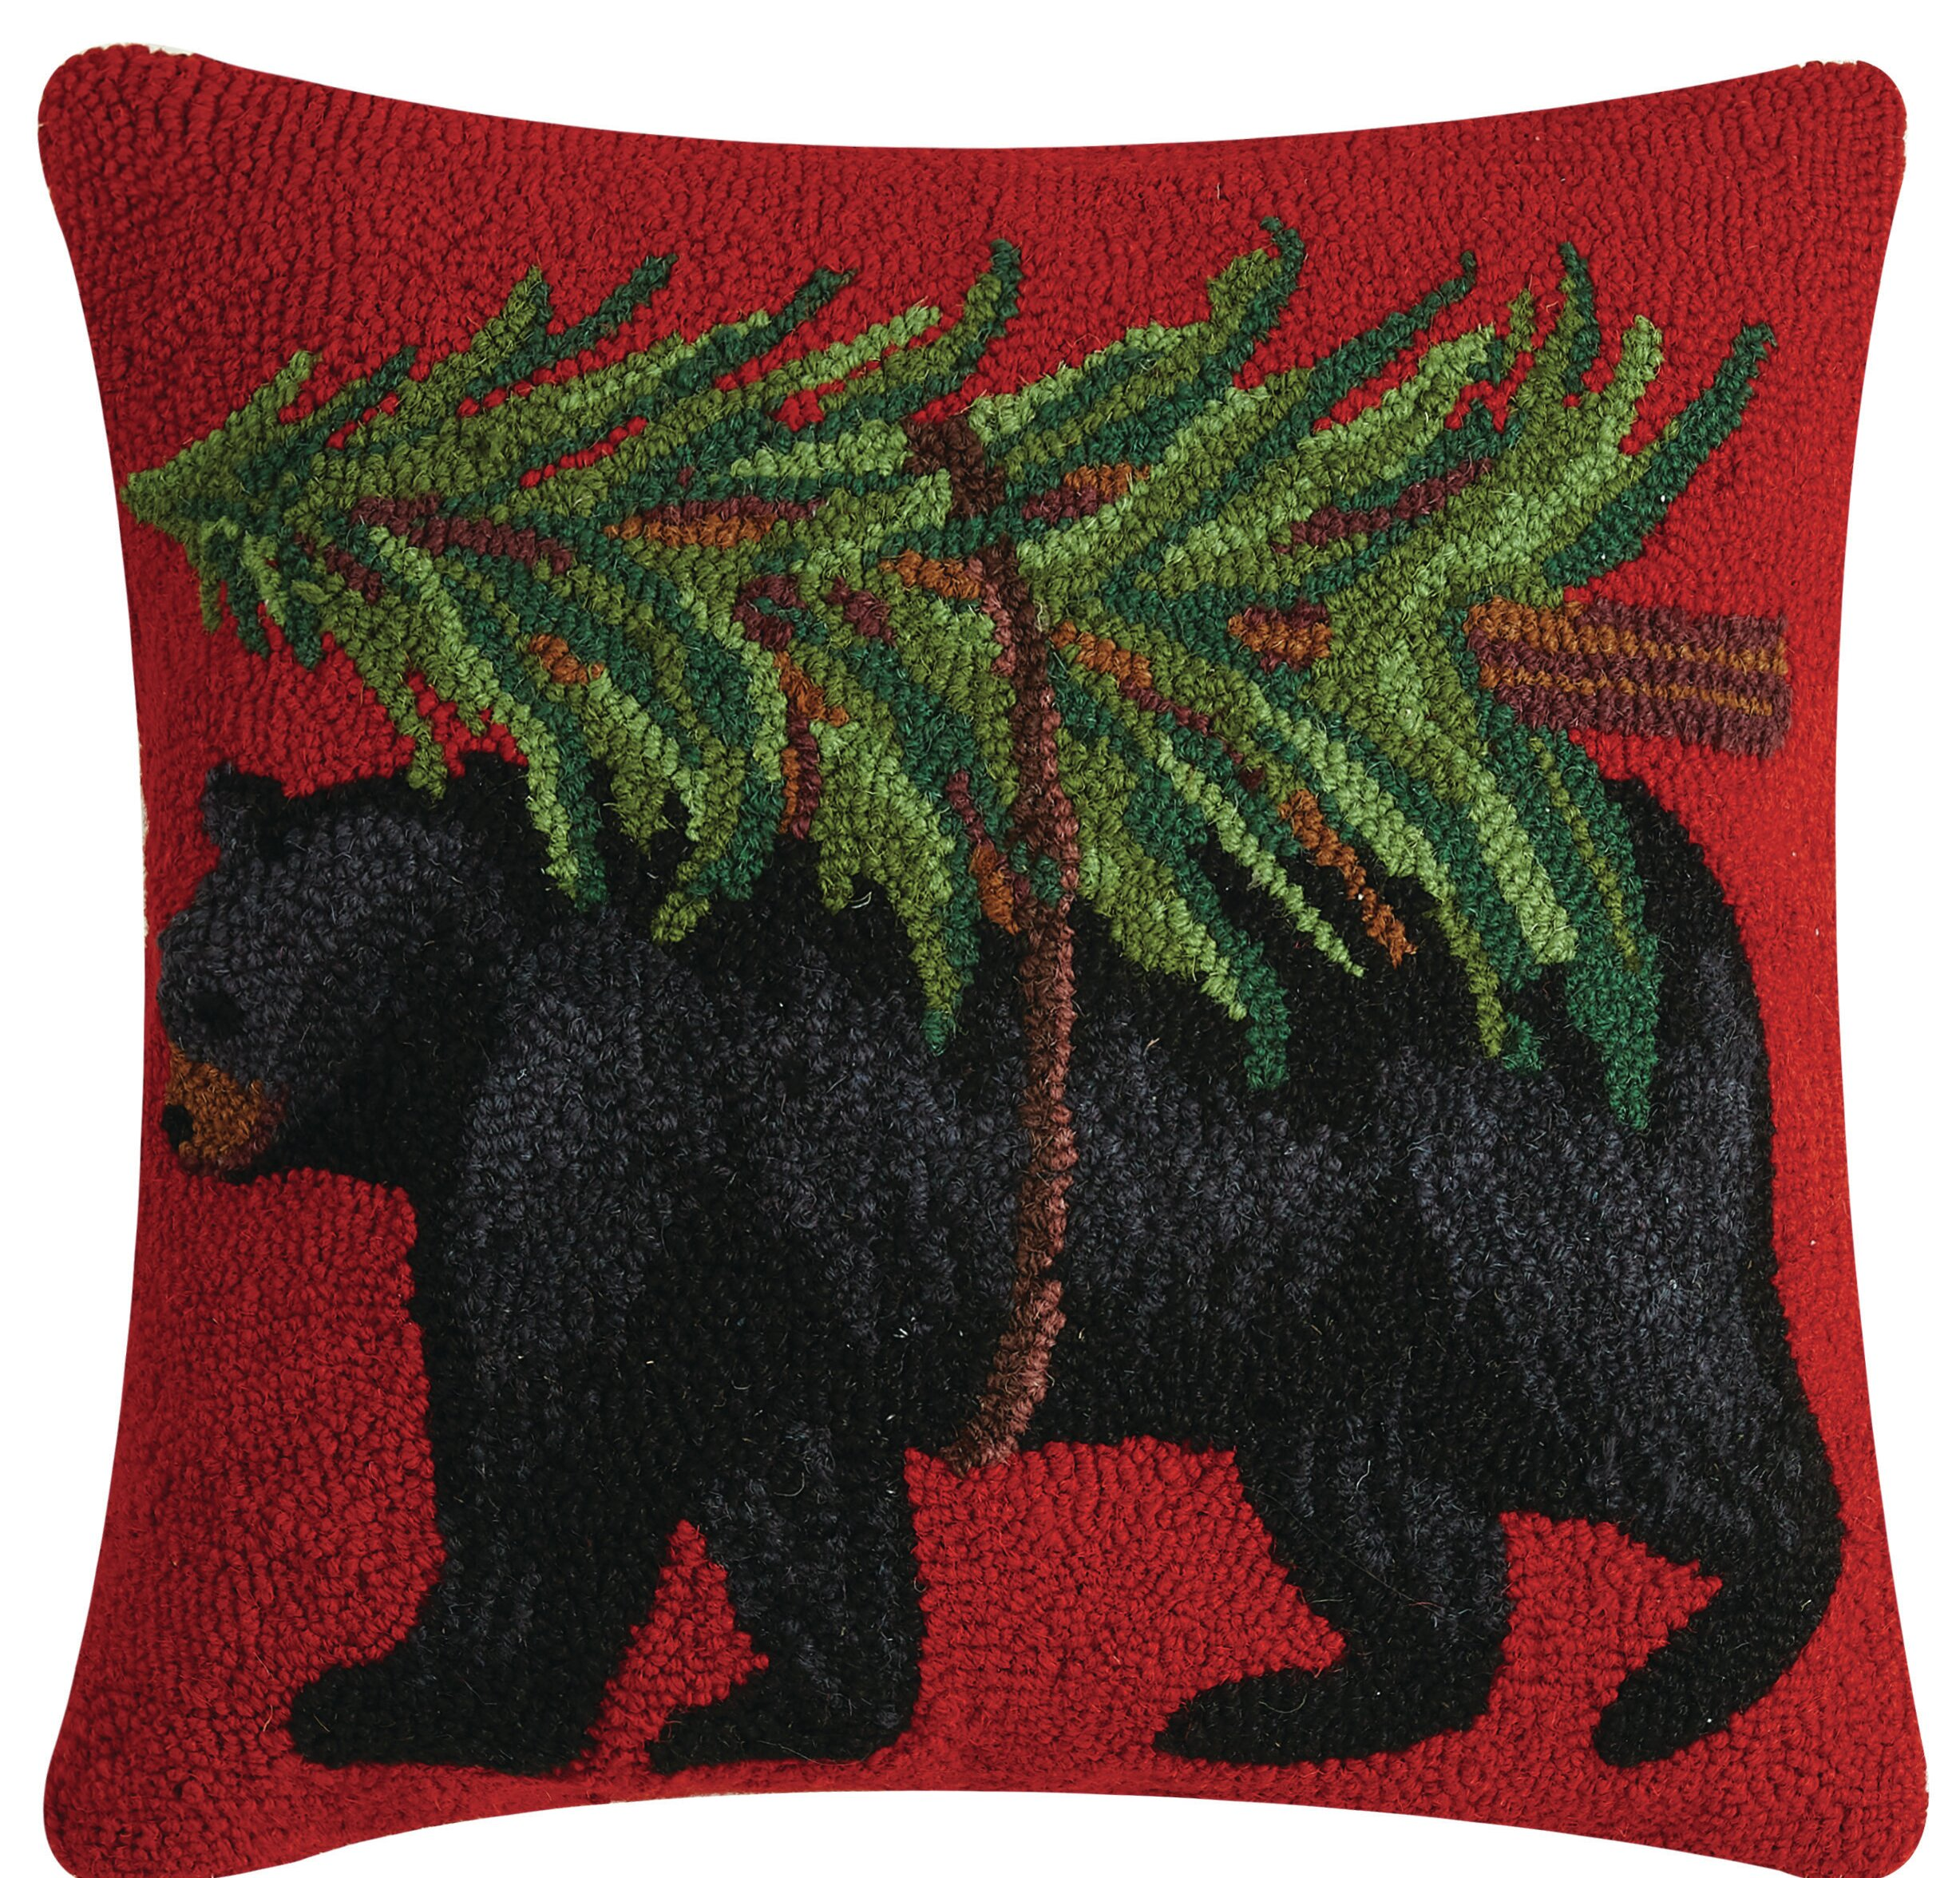 Animal Print Christmas Throw Pillows You Ll Love In 2021 Wayfair